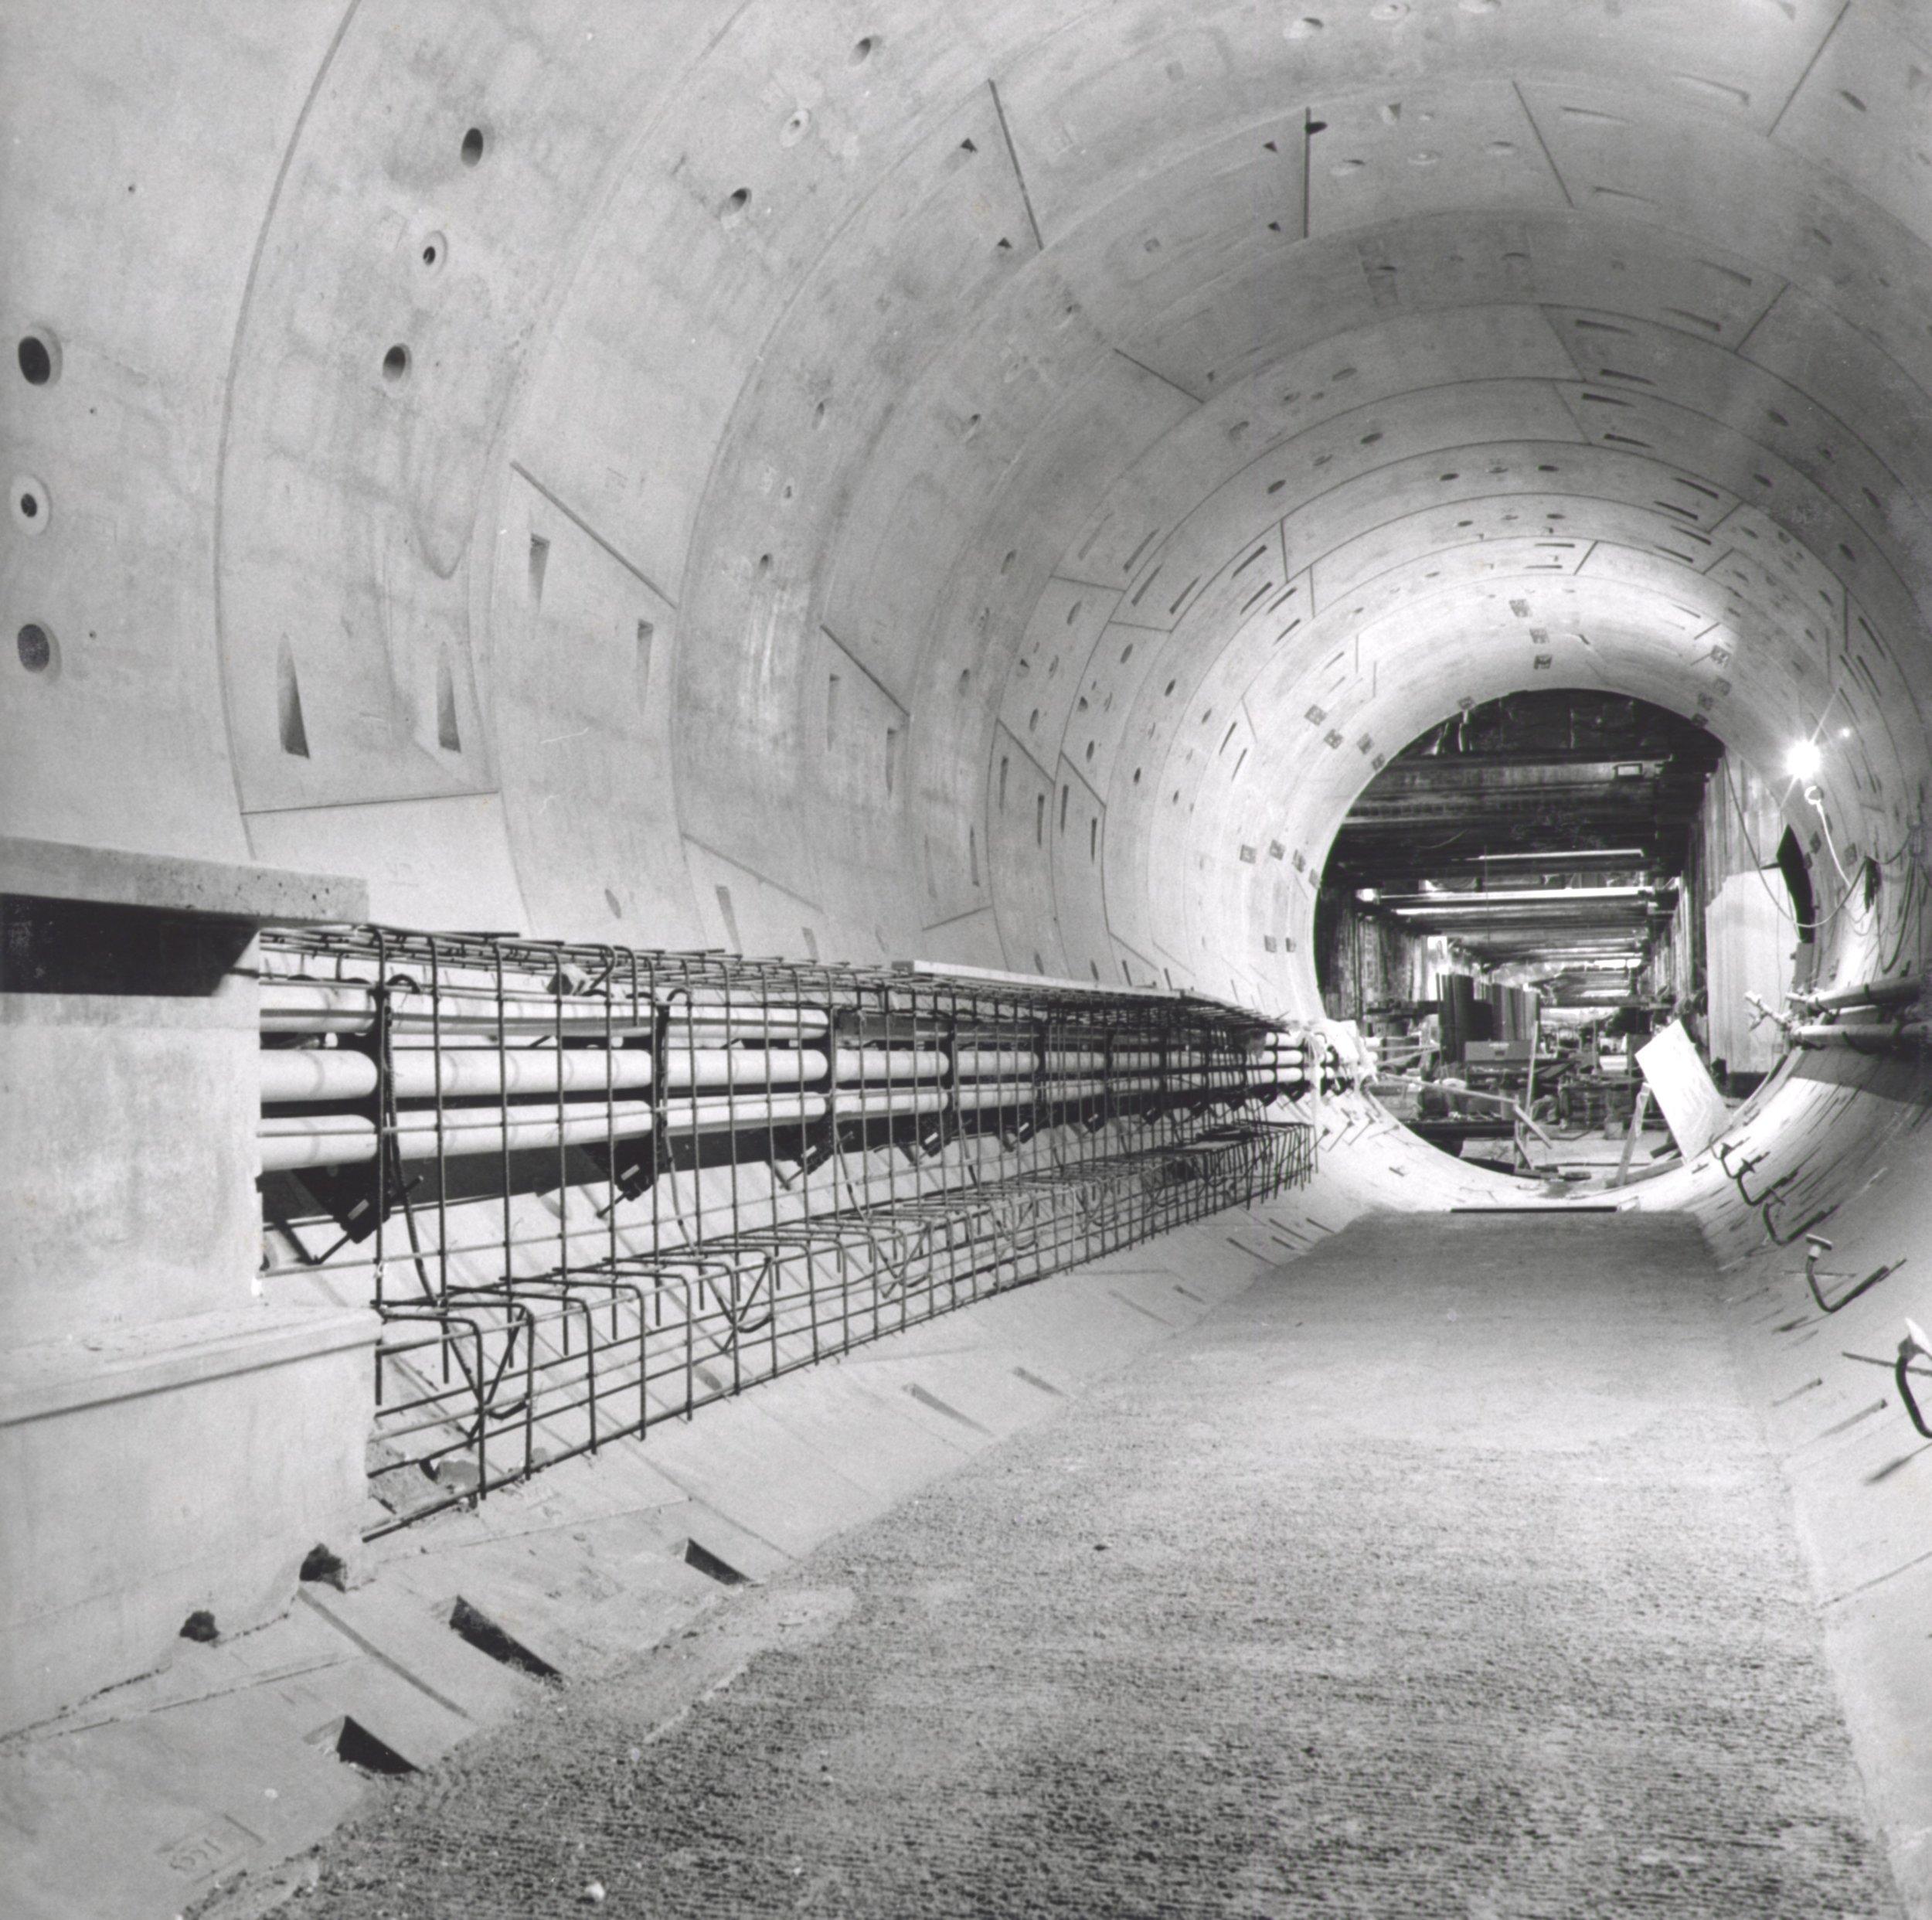 North Tunnel Looking West - Below Flower St. 2019